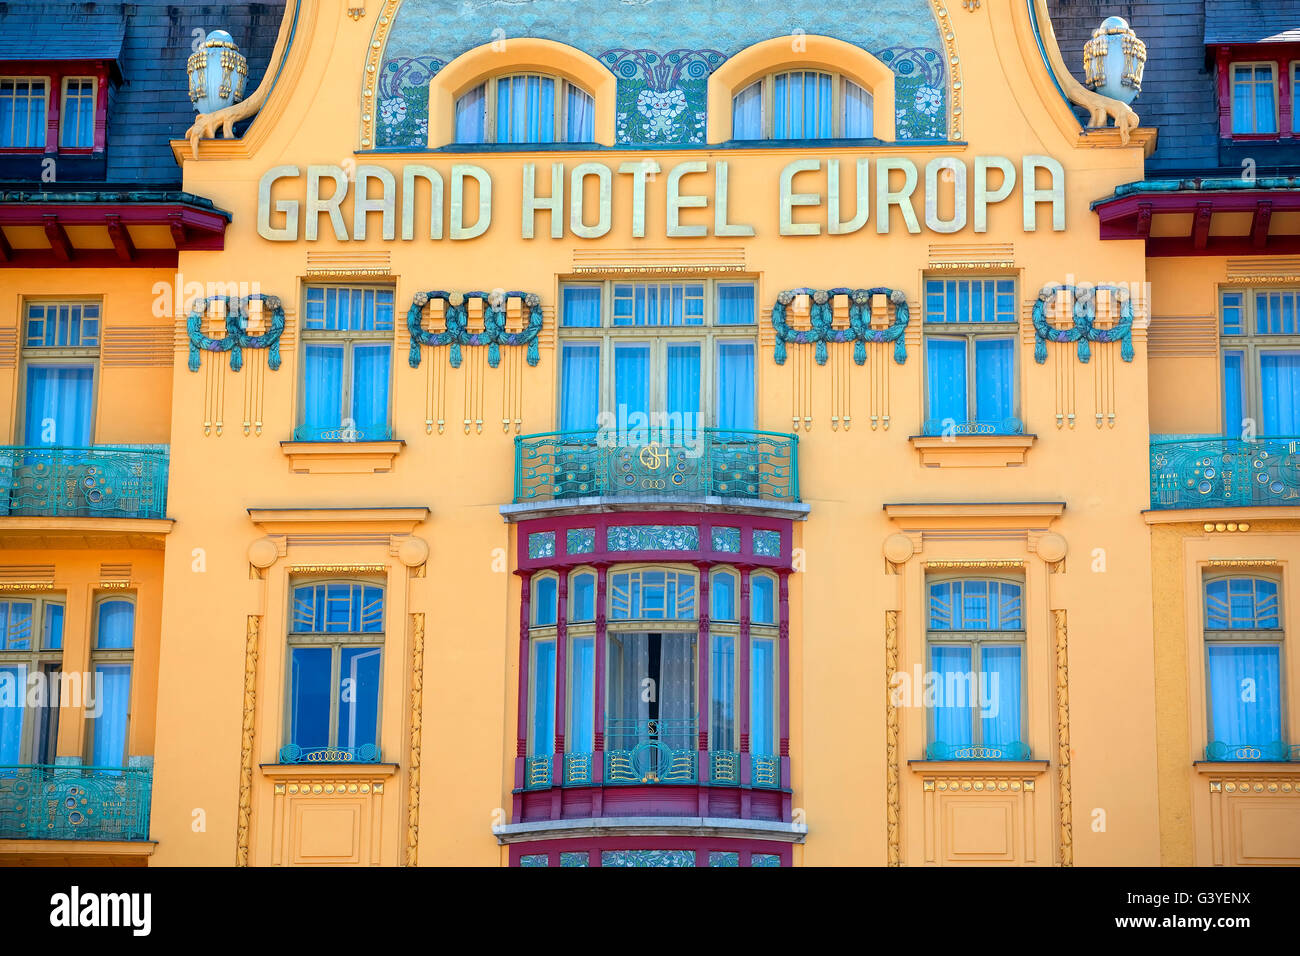 Europa hotel in Wenceslas square in Prague - Stock Image